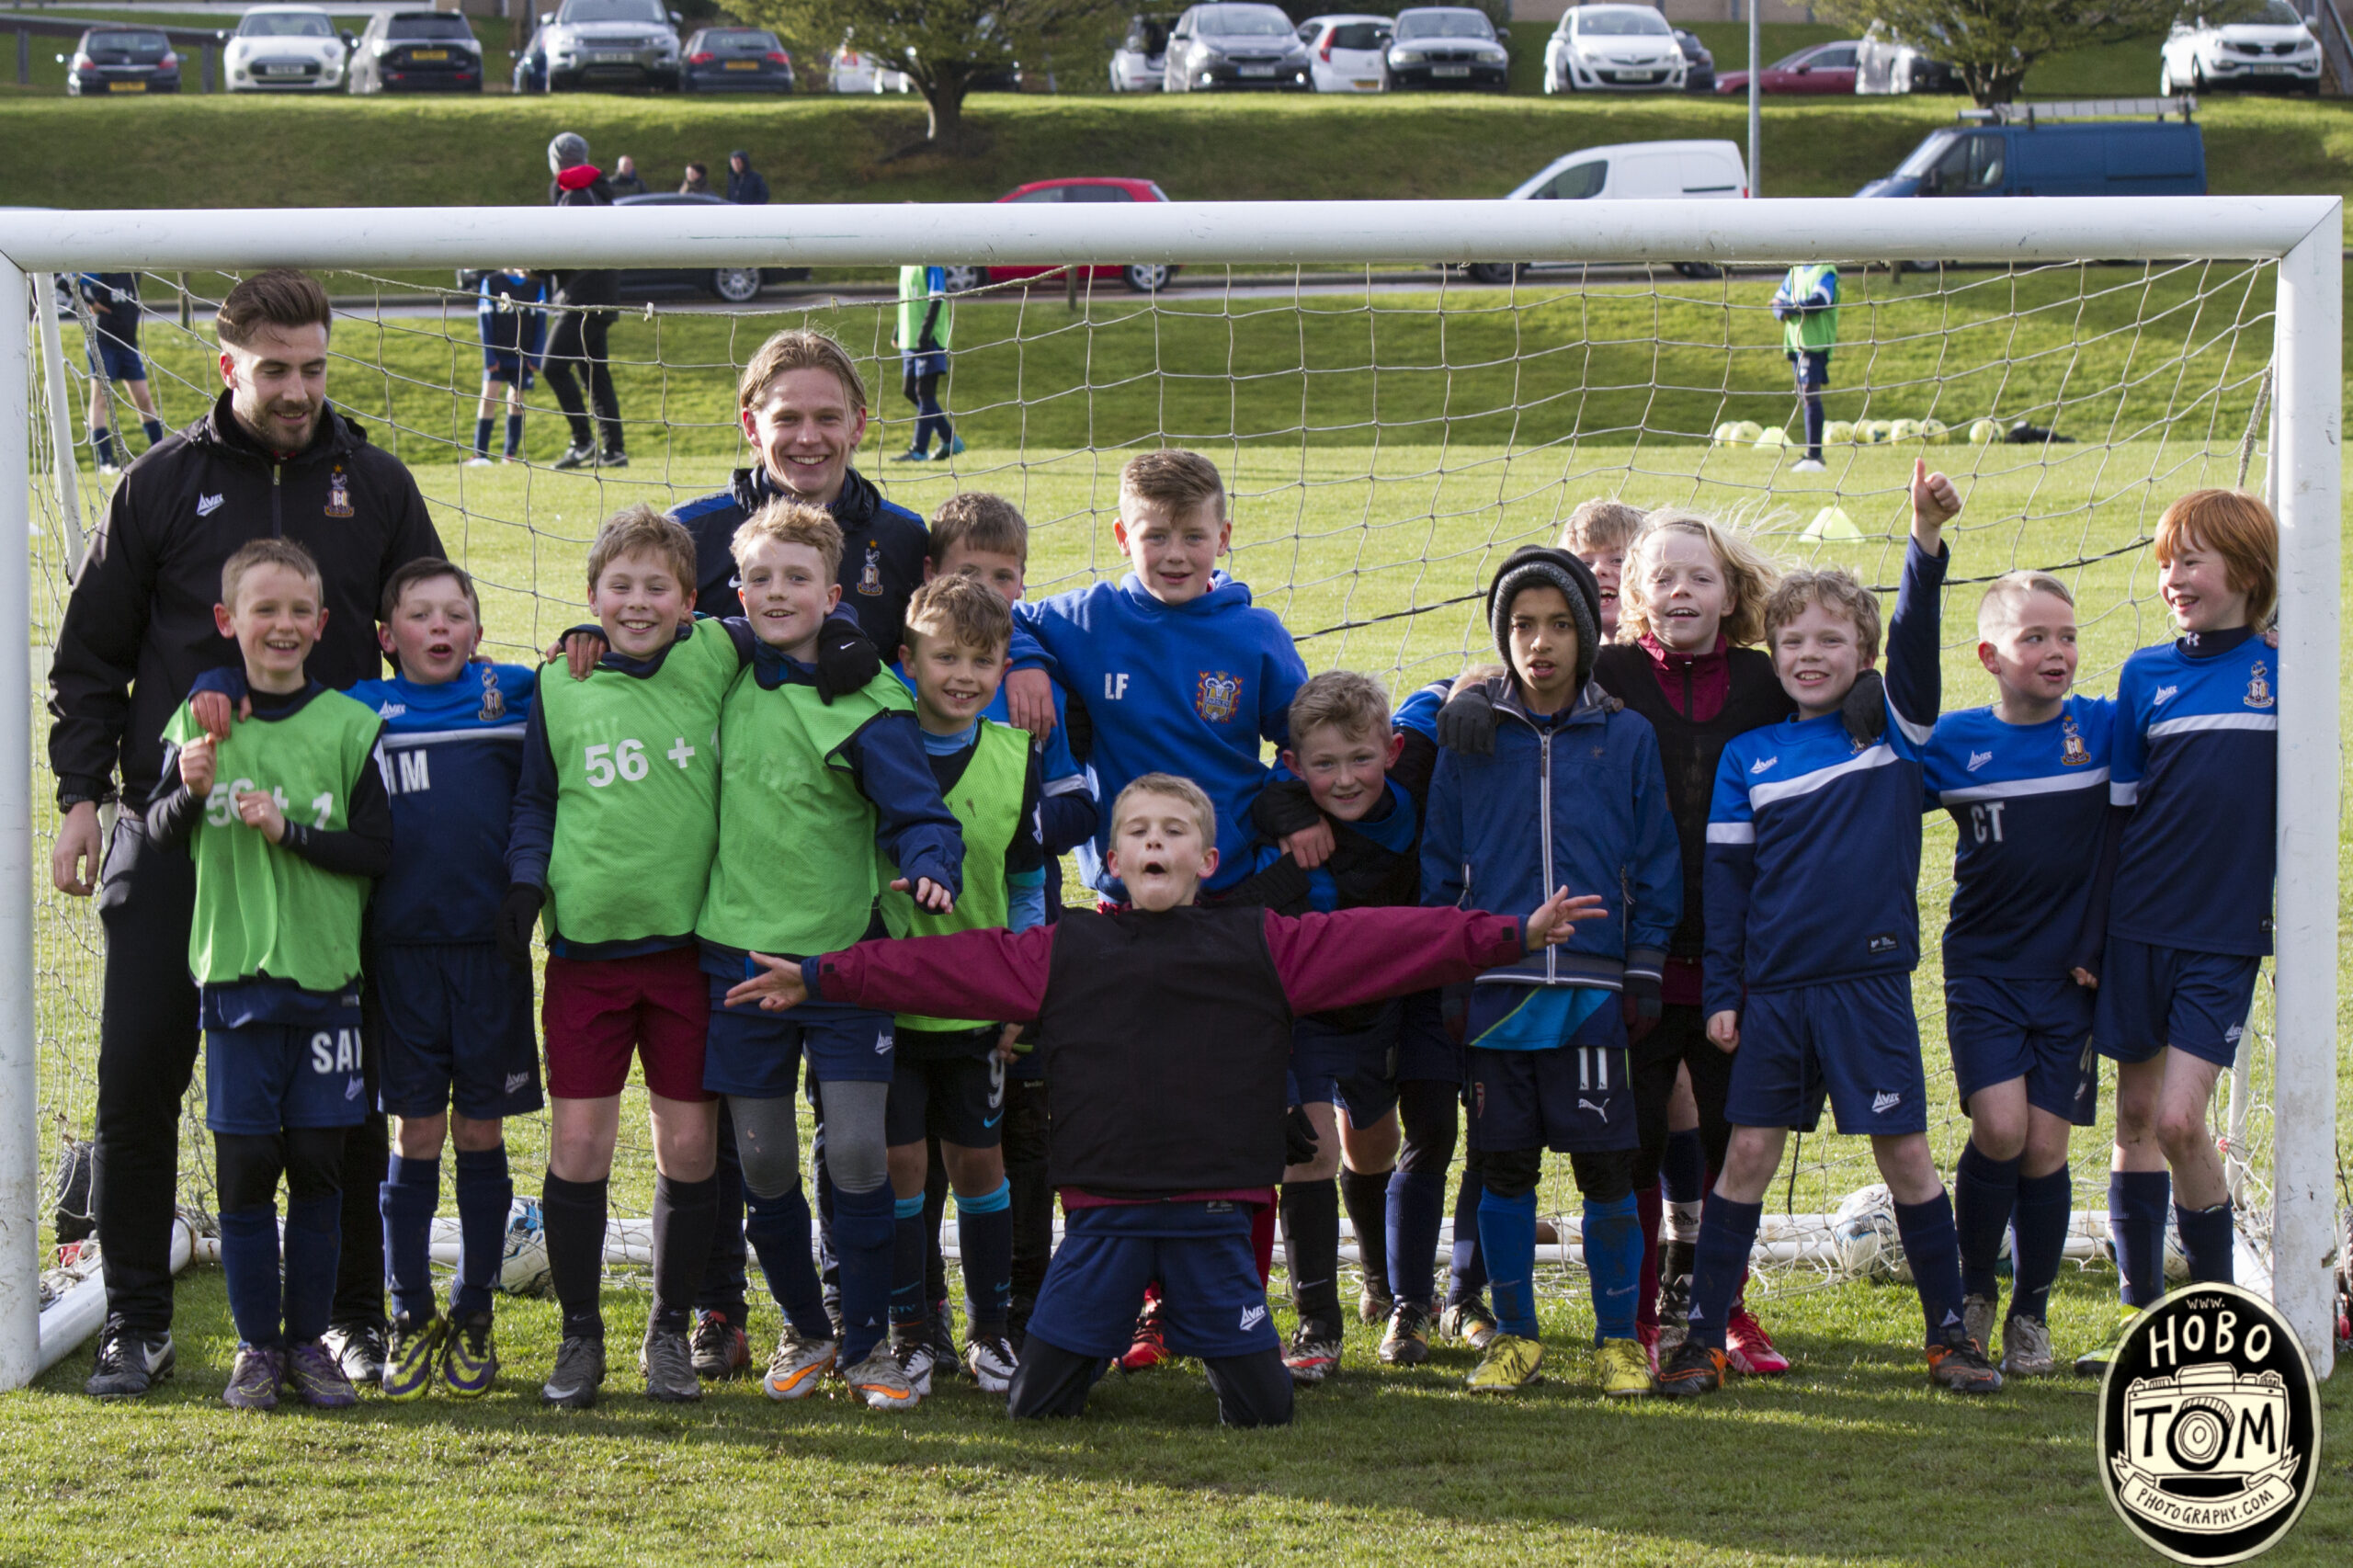 Bradford City Academy – Training